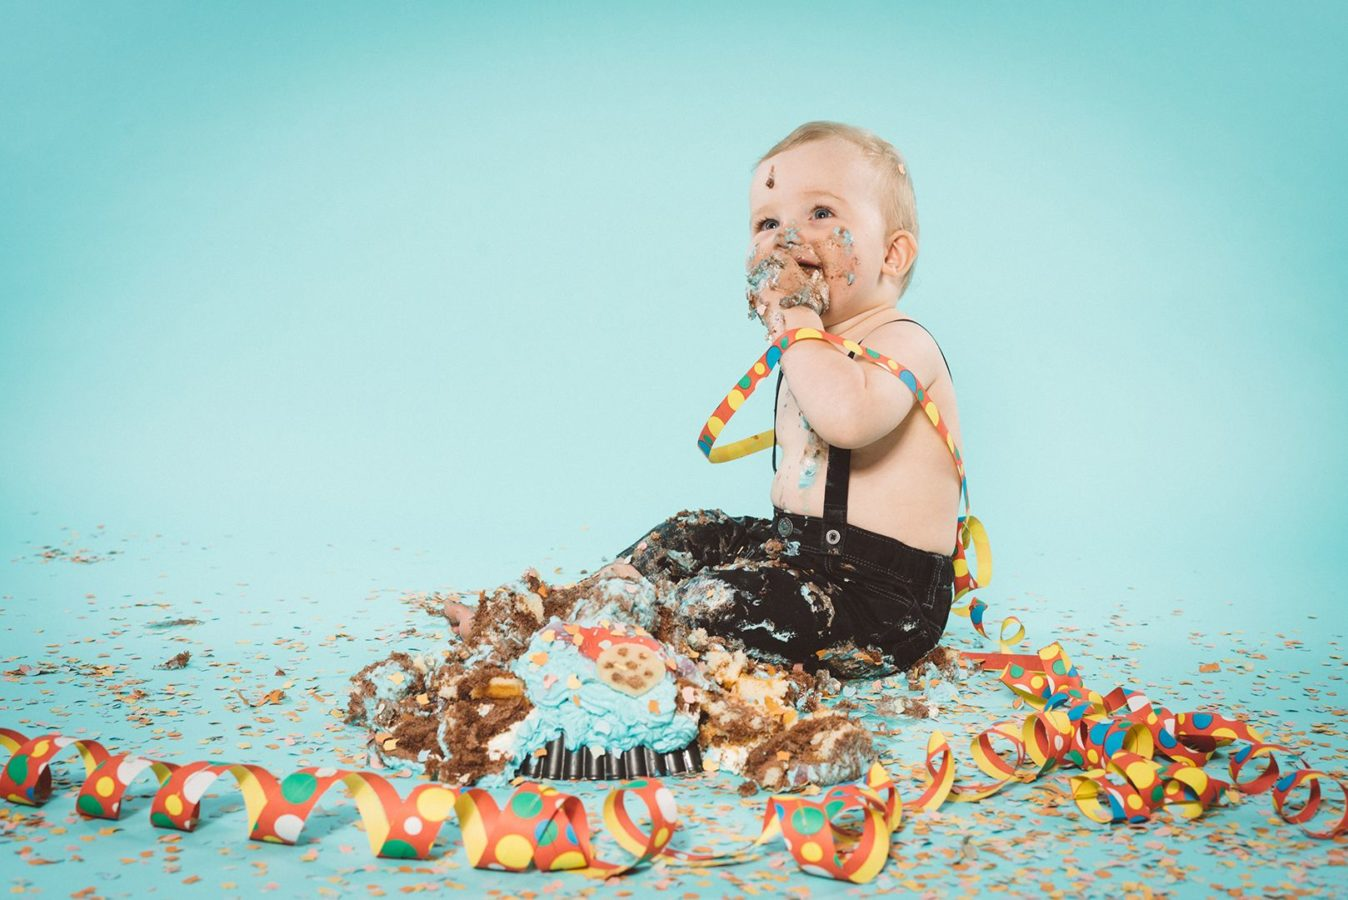 Smash Cake Kinderfotografie Studio Rostock Kind Lachen